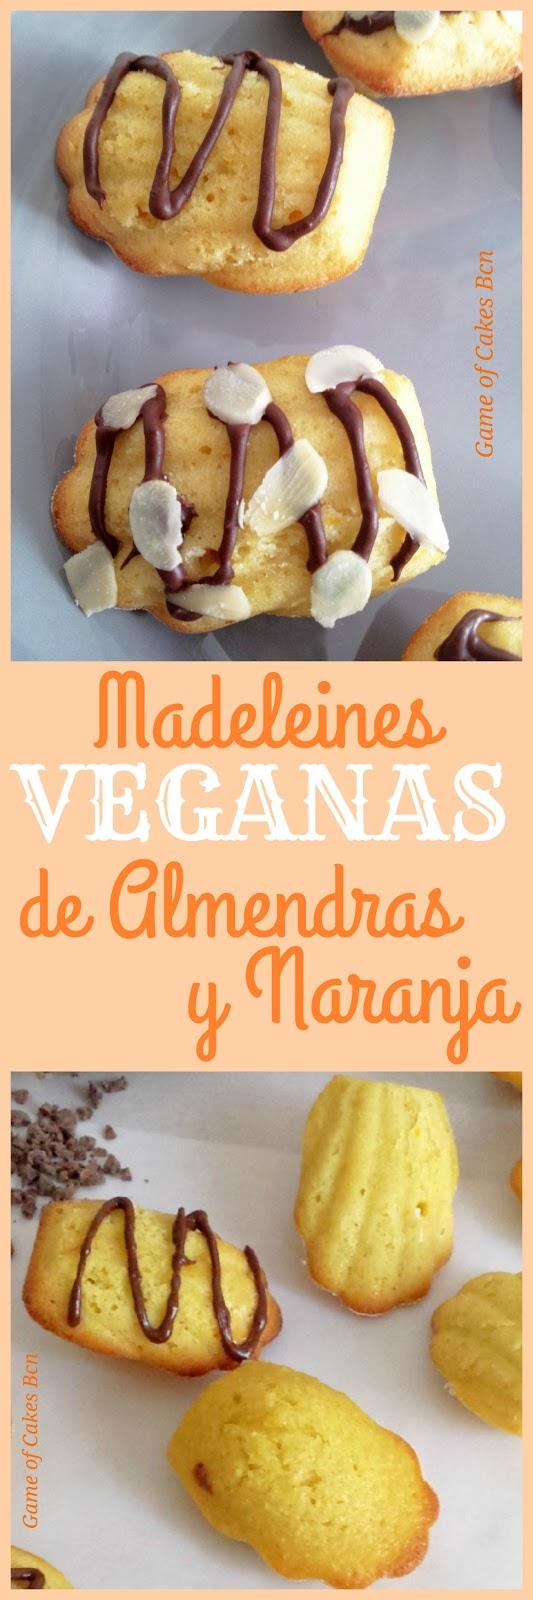 Madeleines veganas de almendra y naranja